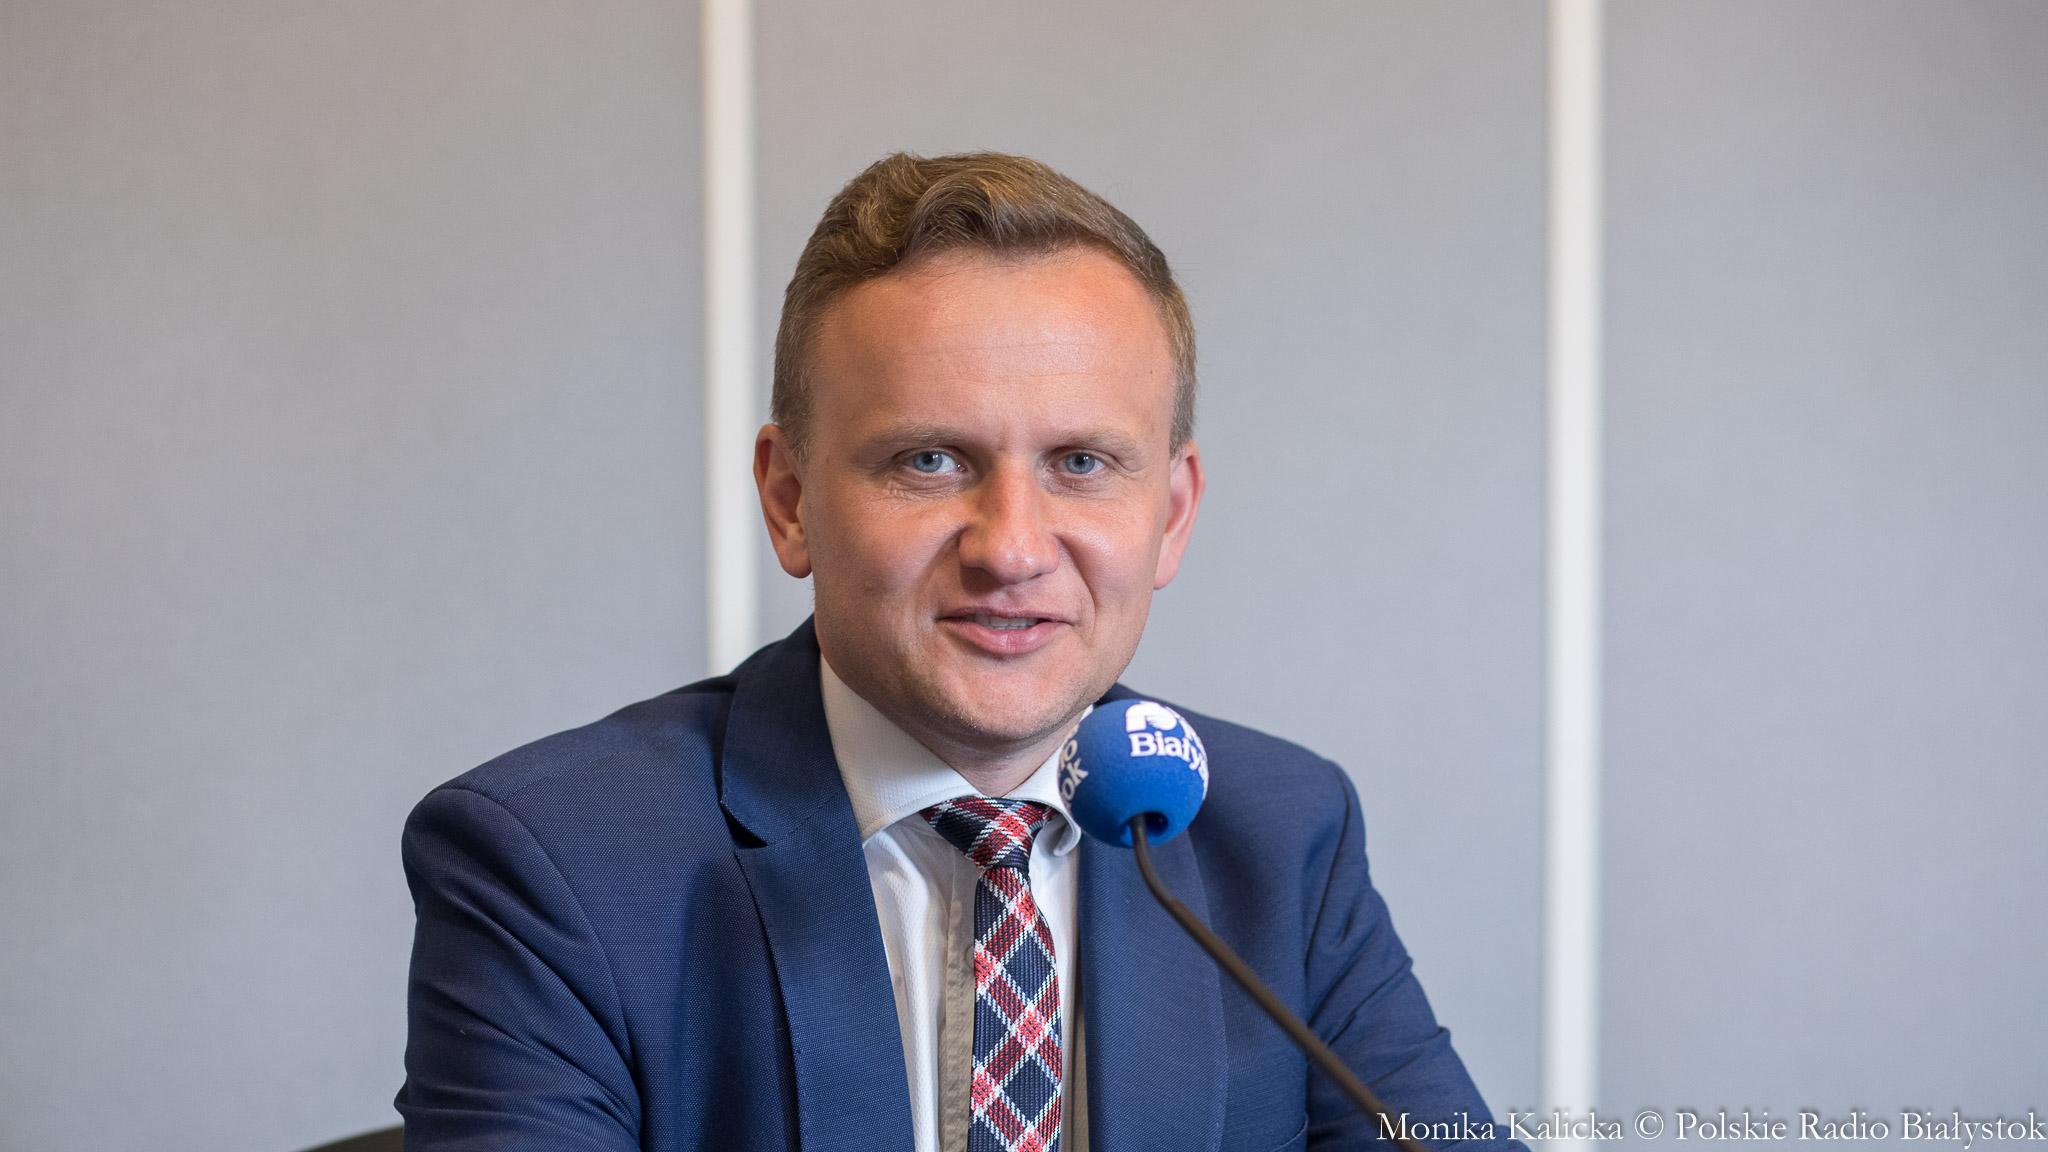 Bartosz Marczuk, fot. Monika Kalicka (archiwum)